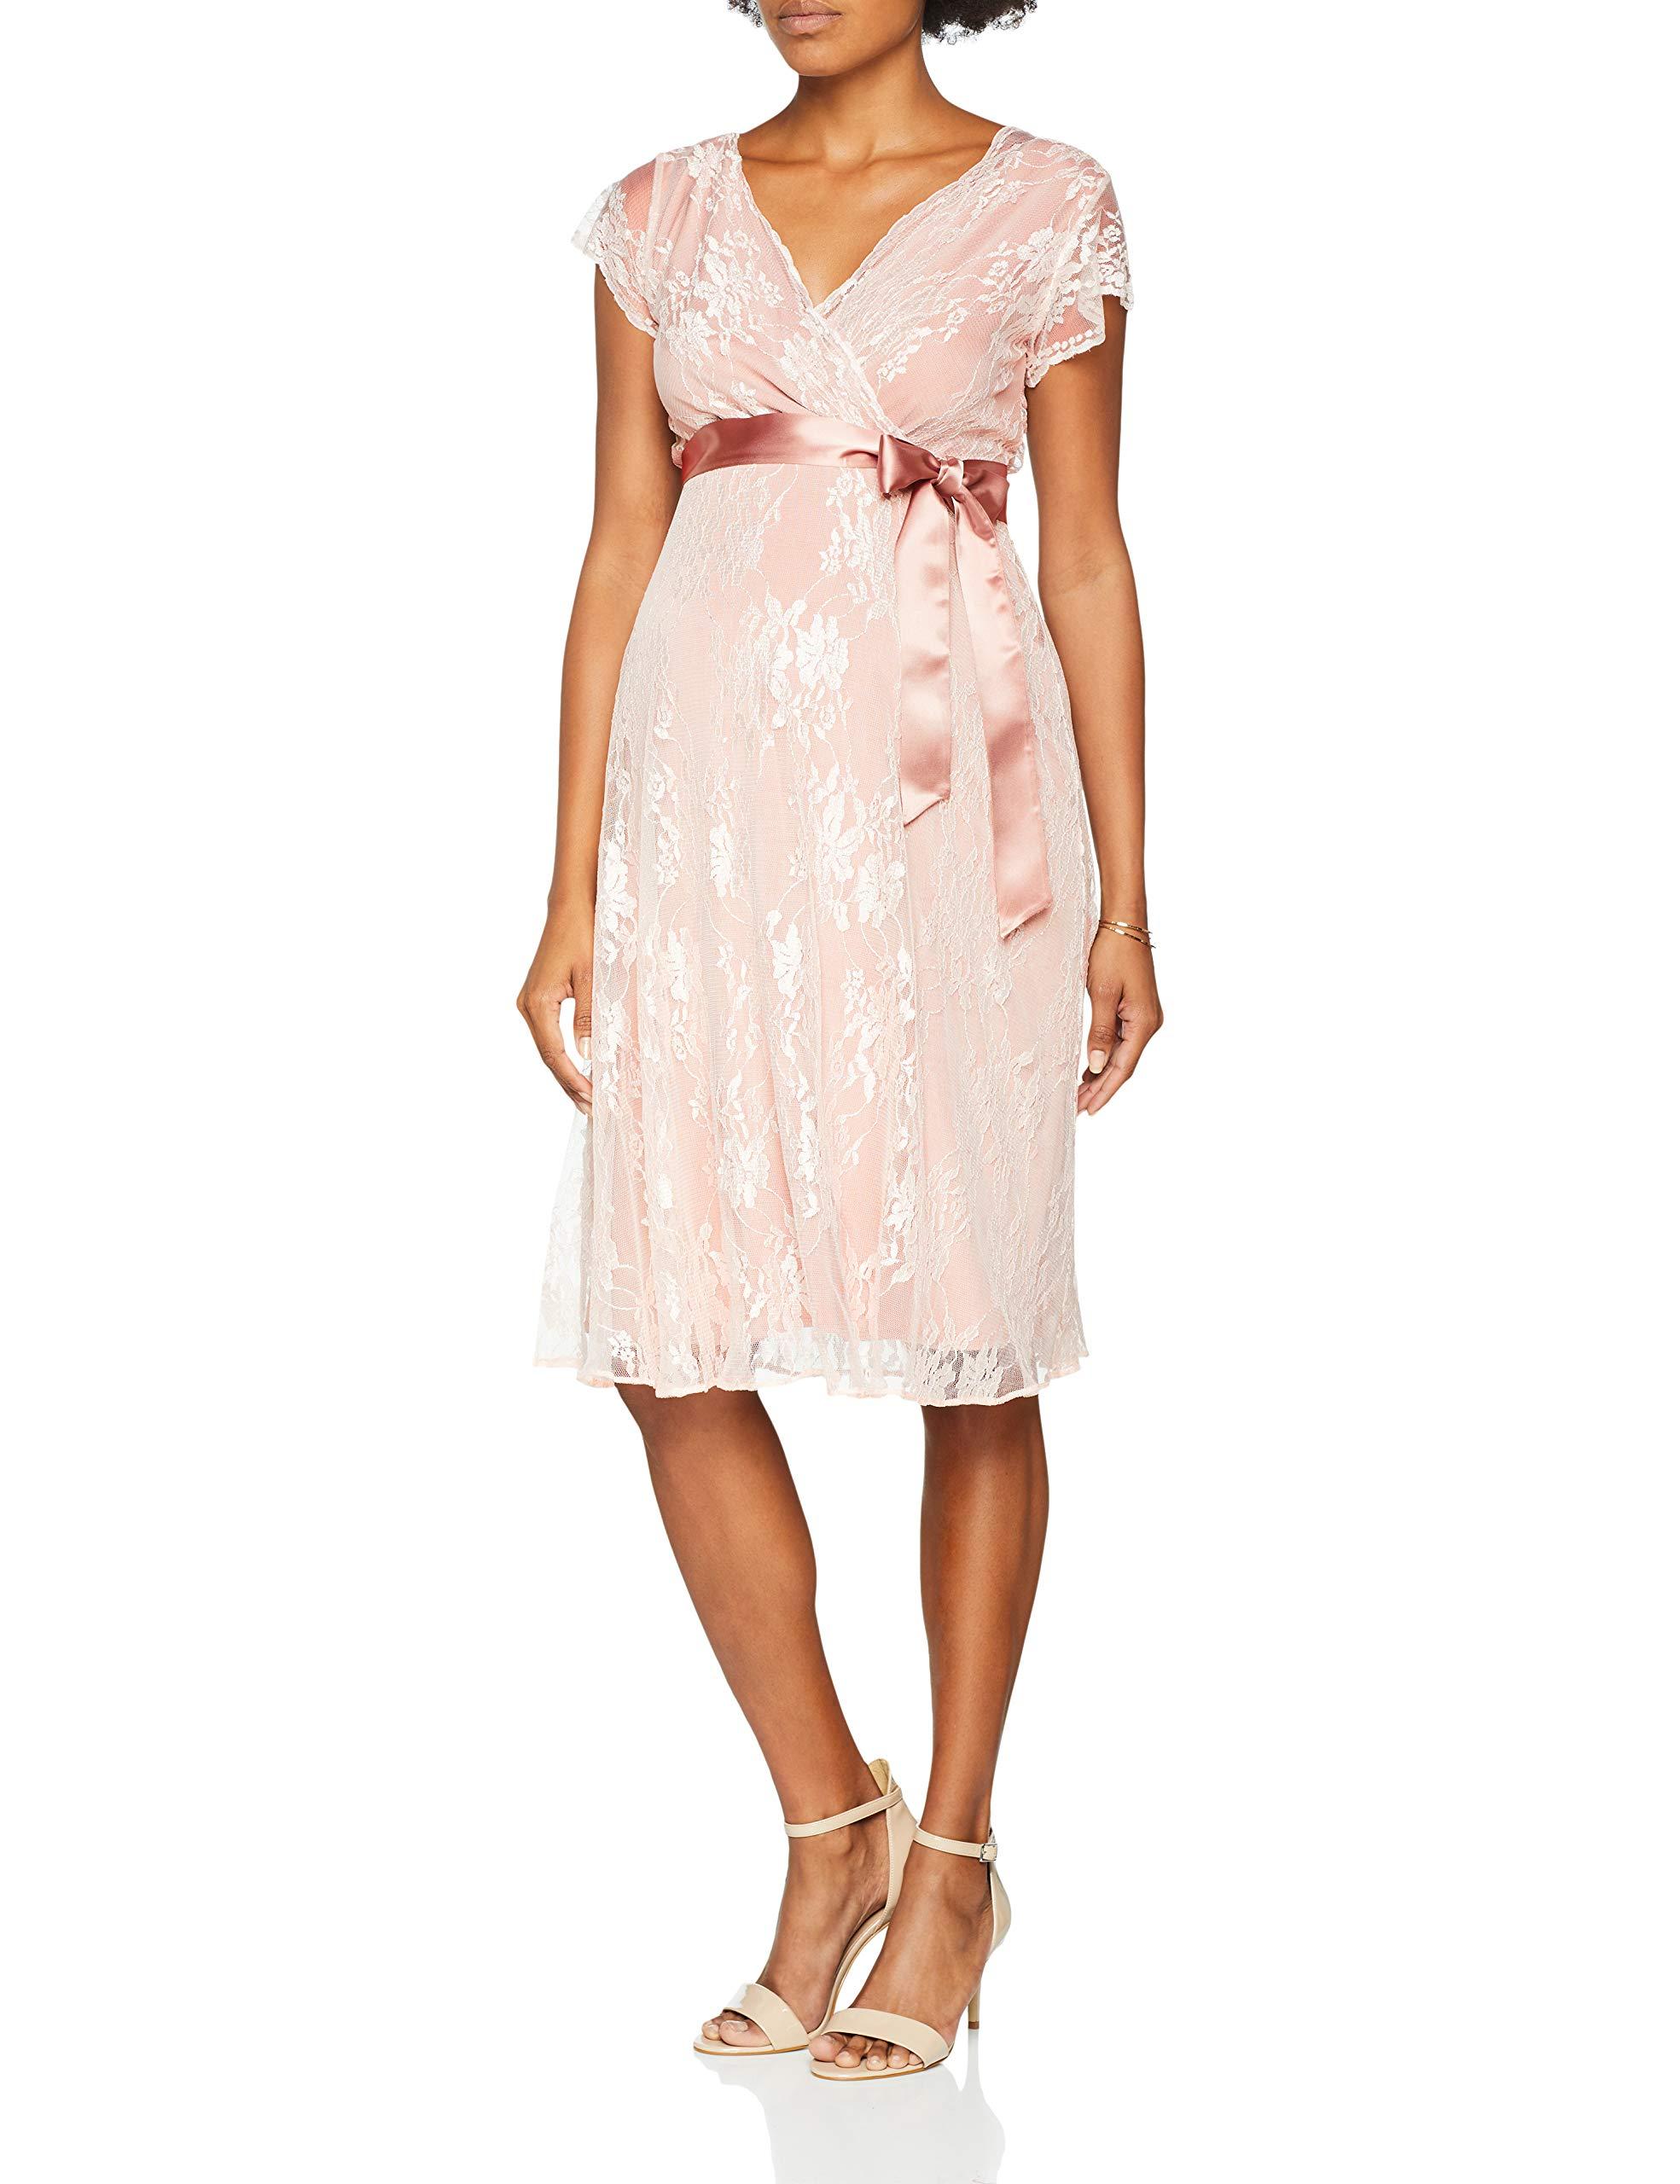 Robeblush Femme Rose Tiffany Eden pink40 001 QhrCtsd